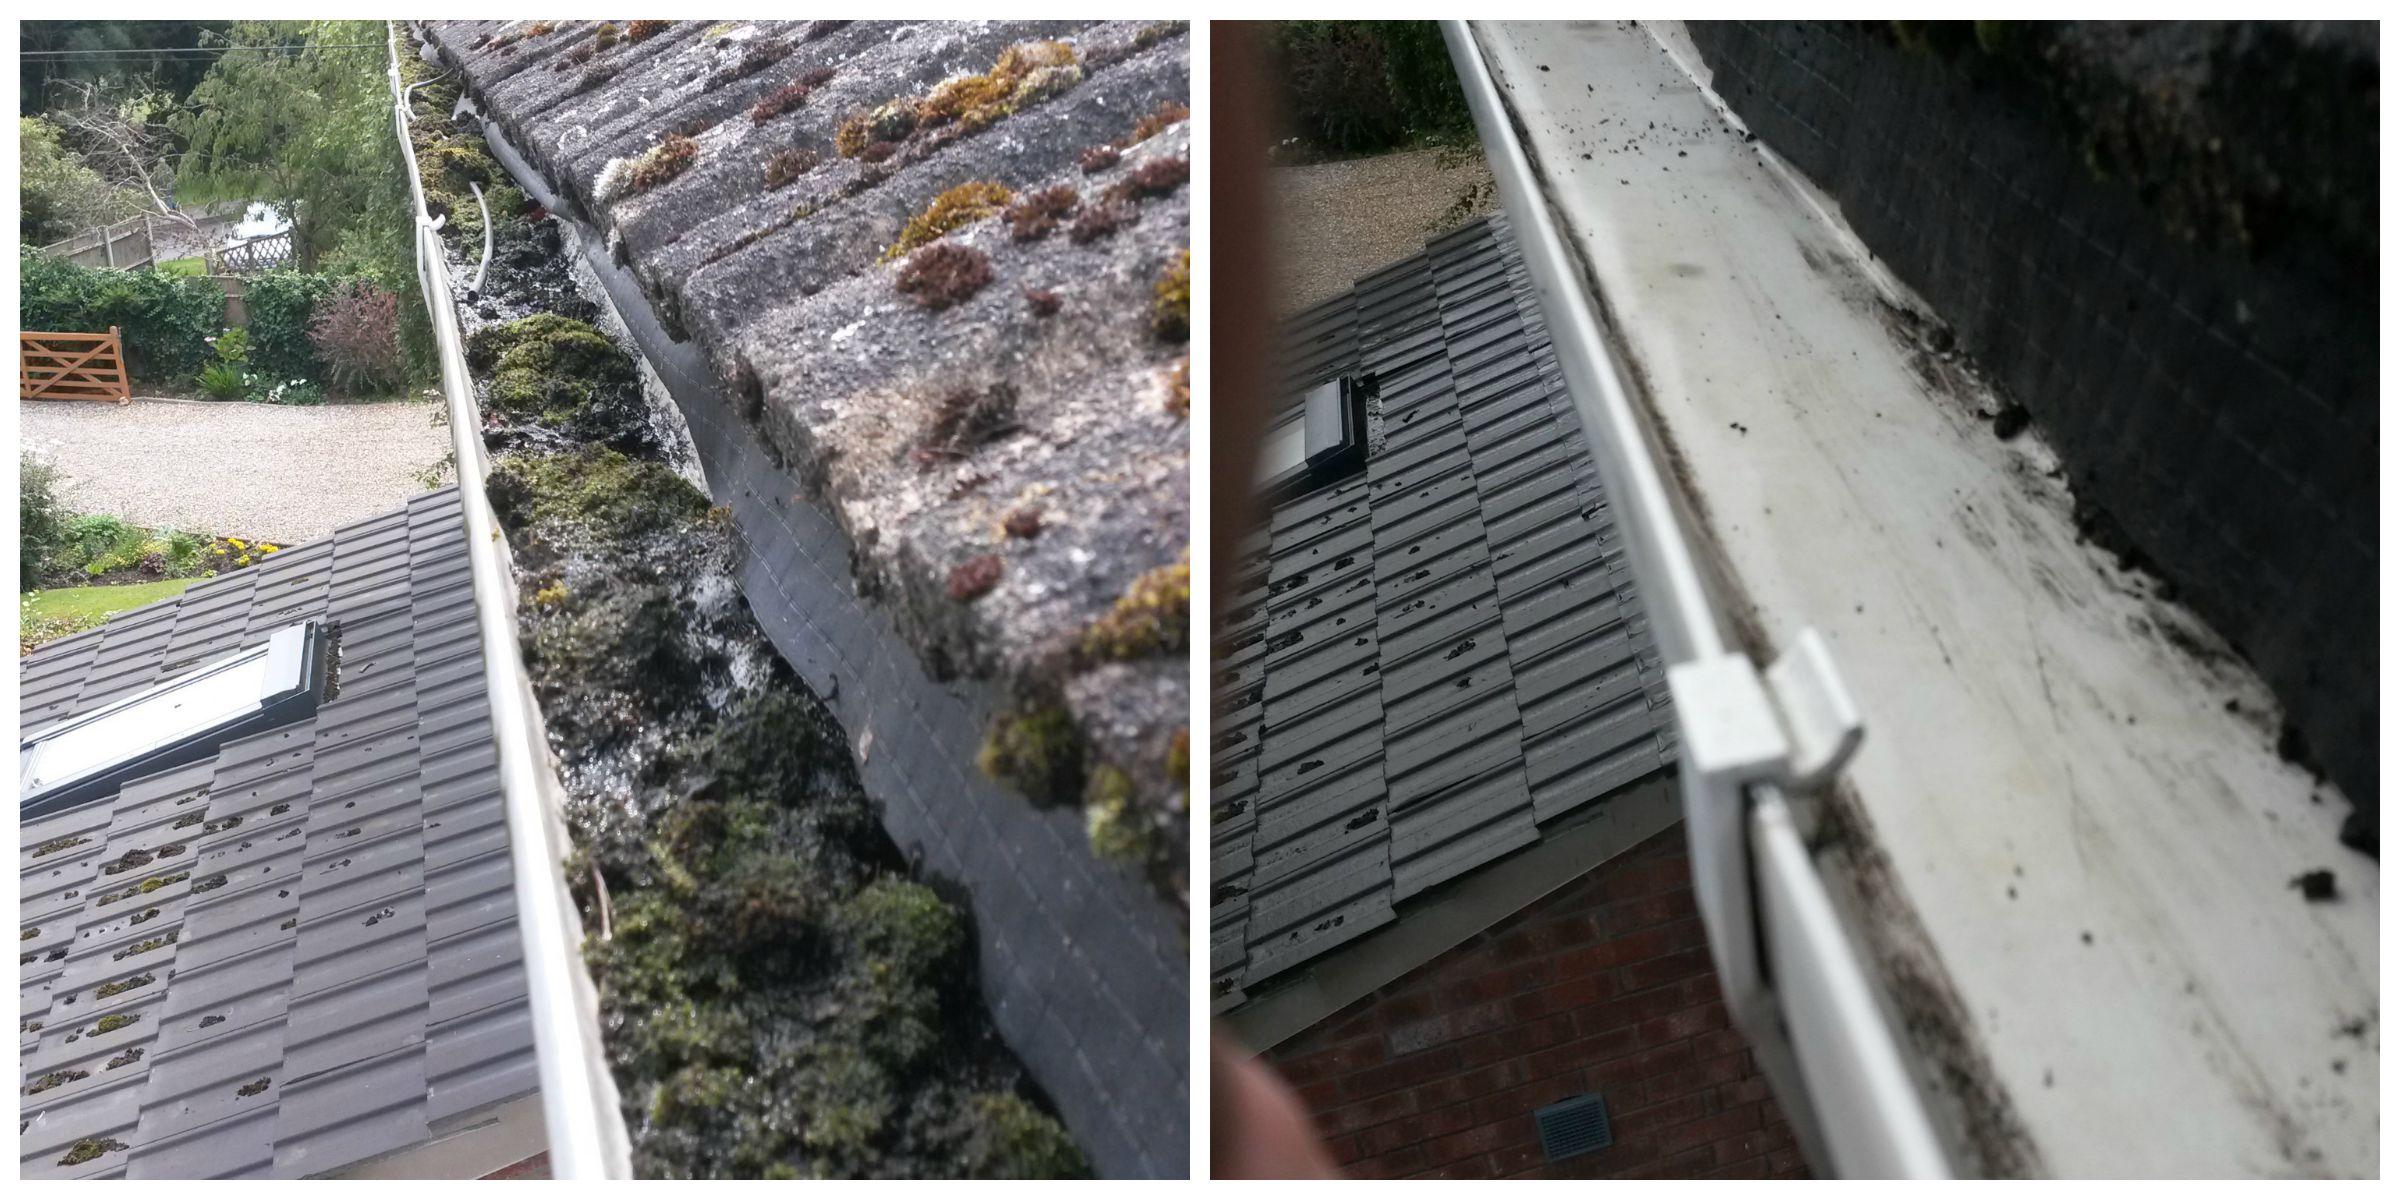 Norfolk Pressure Washinggutters Blocked Let Us Clear Them